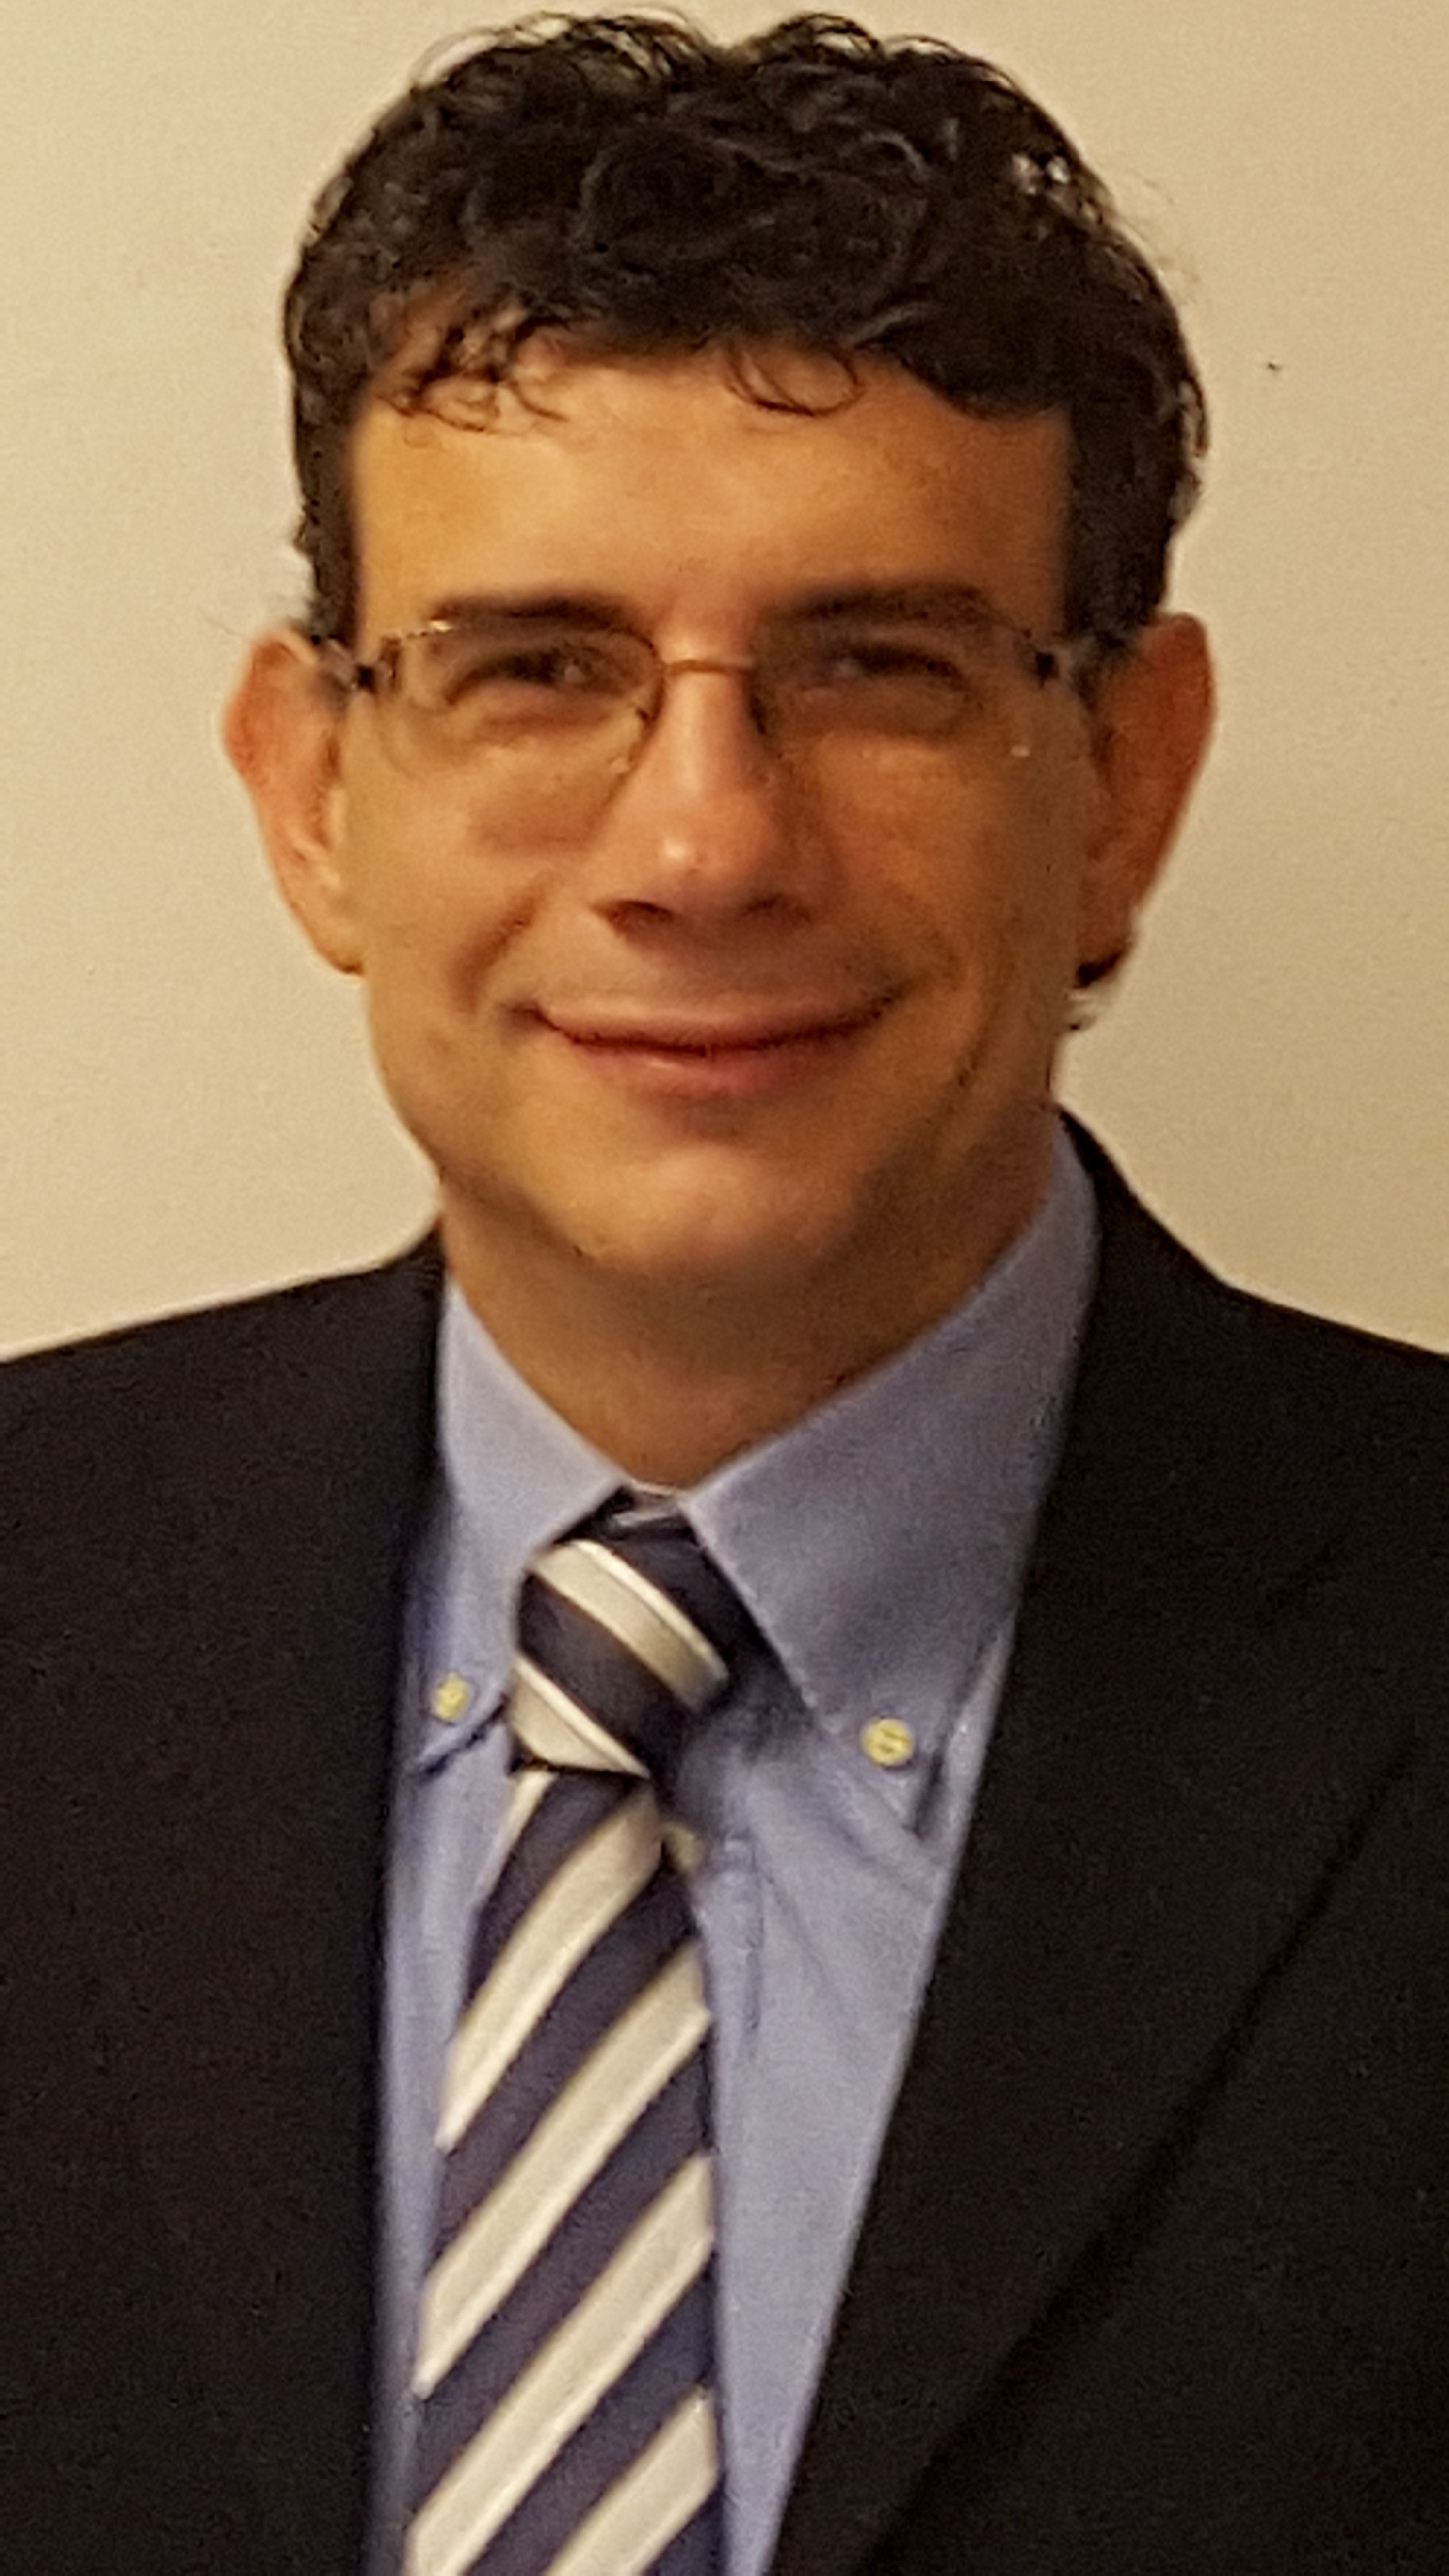 2018-dr-g-stipa